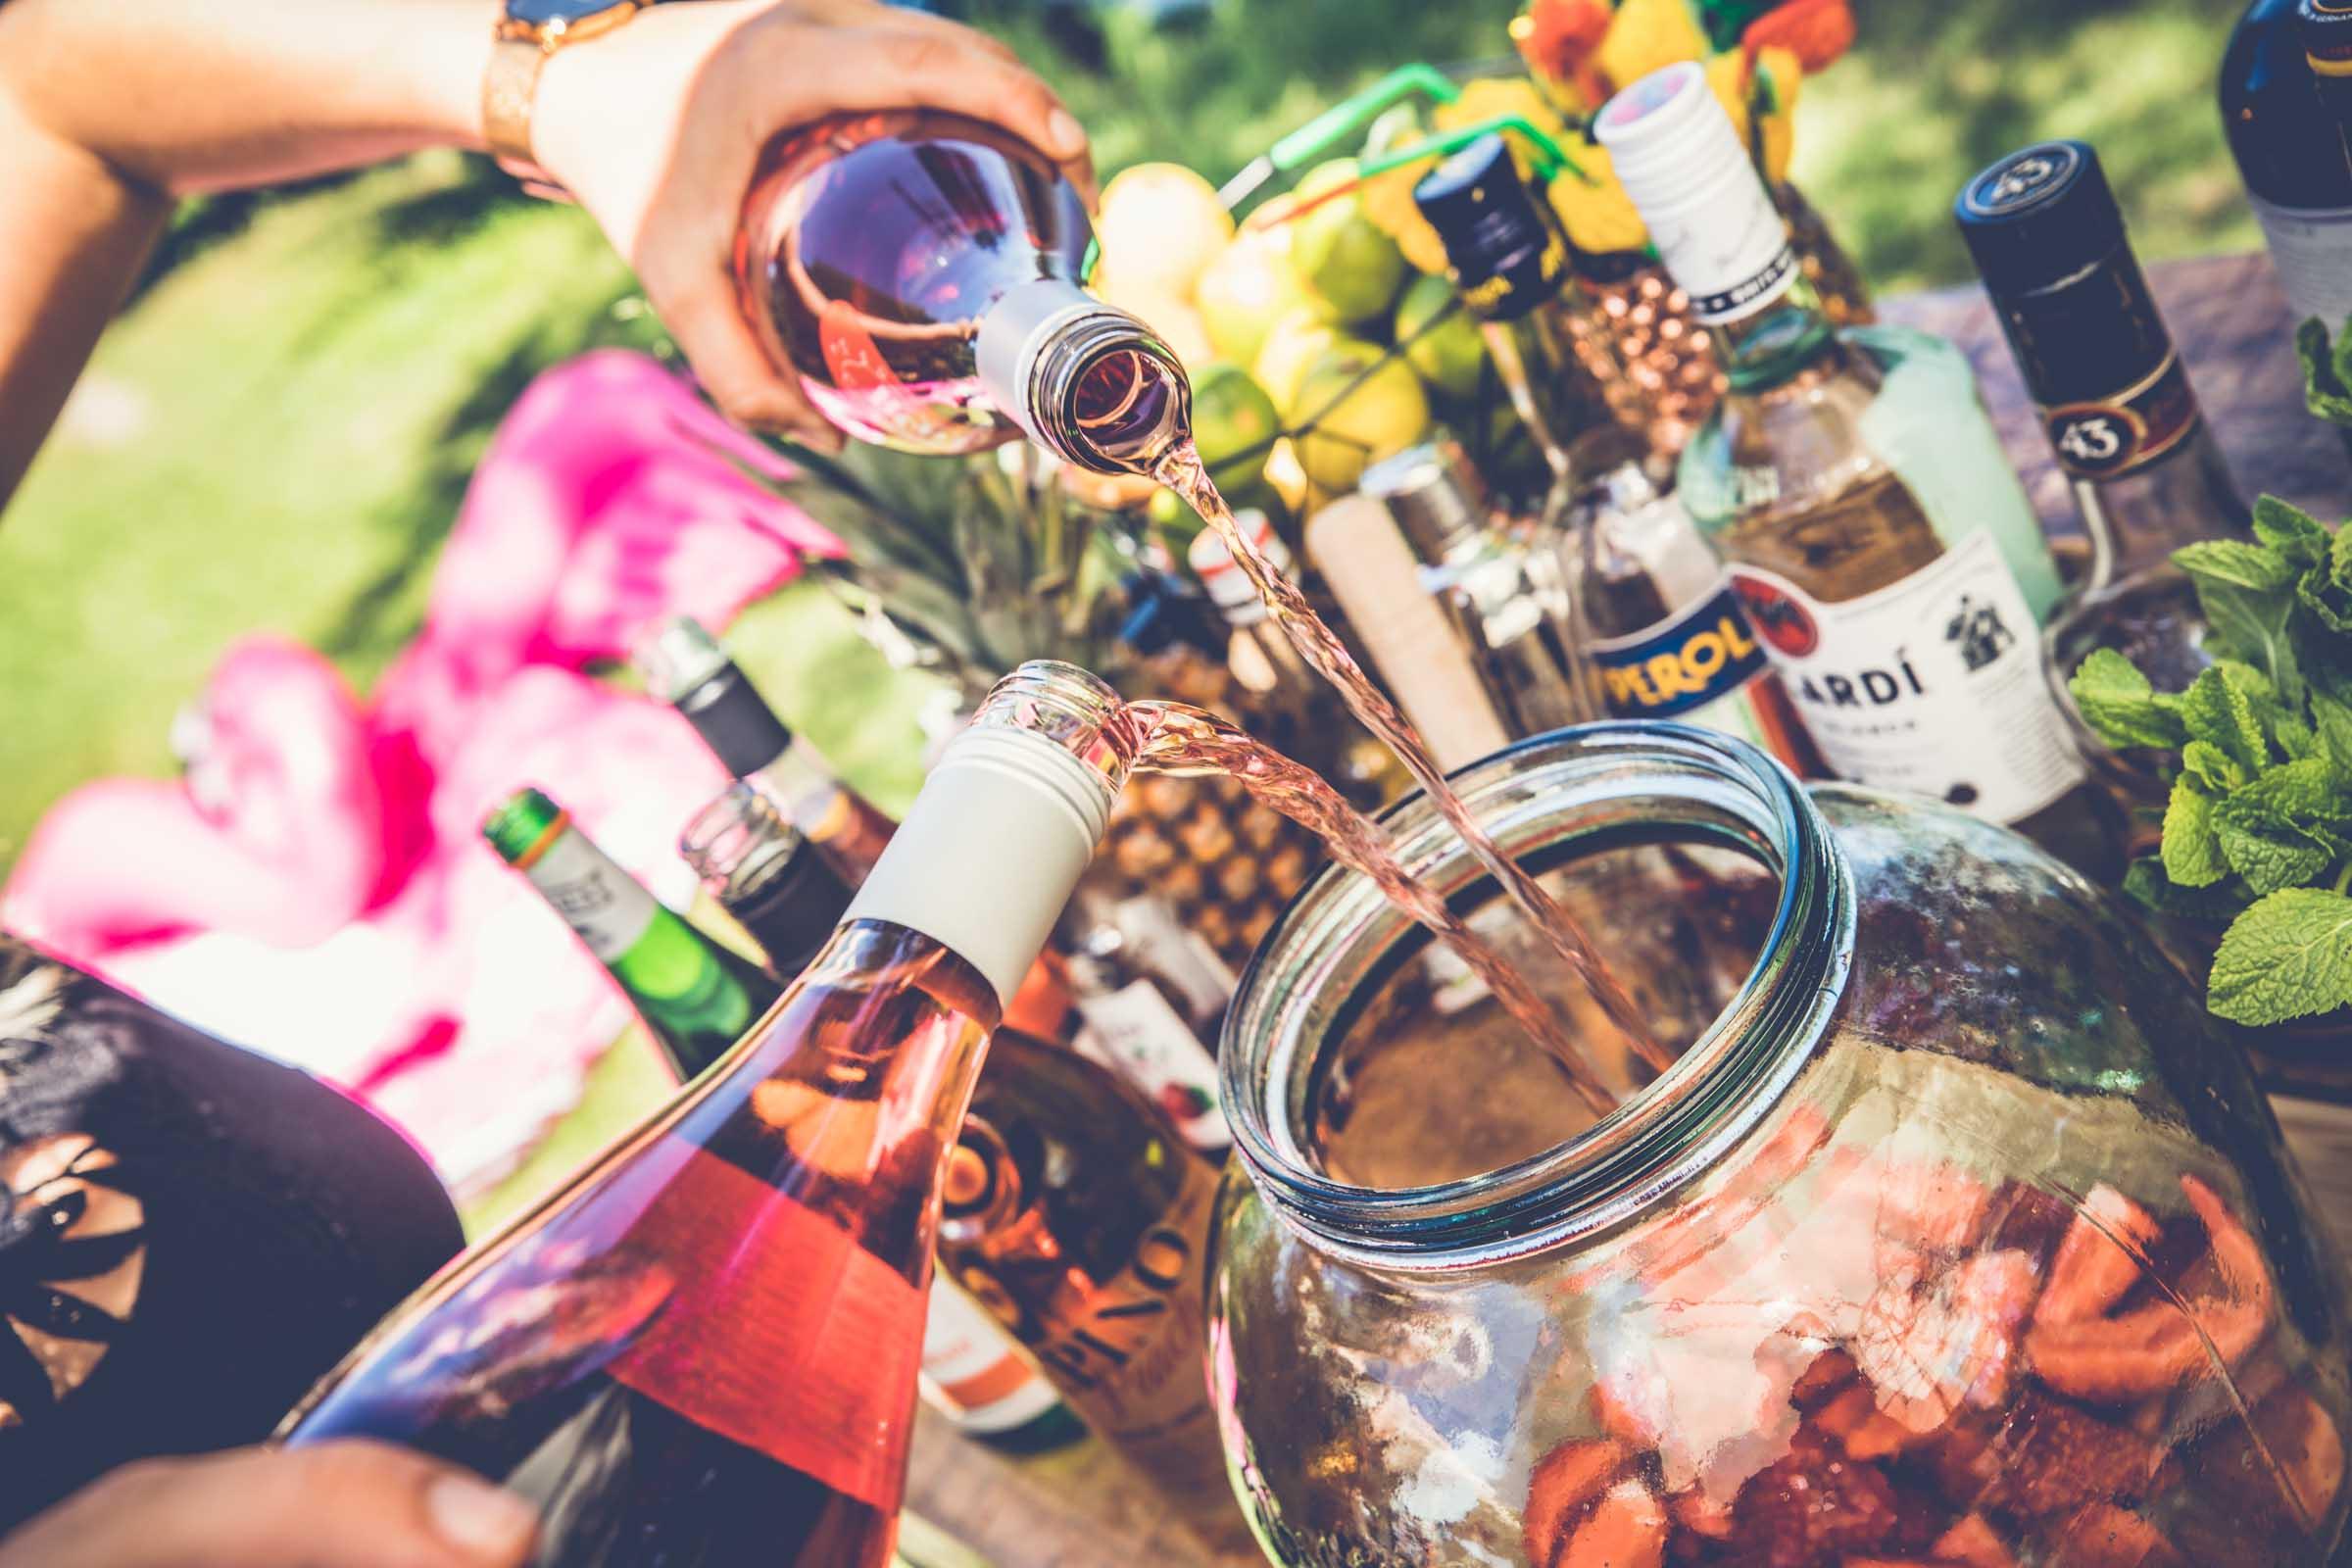 Barformat - Mobile | Bar | Cocktailservice | Hannover | Getränke | Catering | Cocktails | Wein | Aperitif | Bowle | Ginbar | Limonade |Hochzeit | Messe | Firmenfeier | Buchen | Mieten | Anfragen